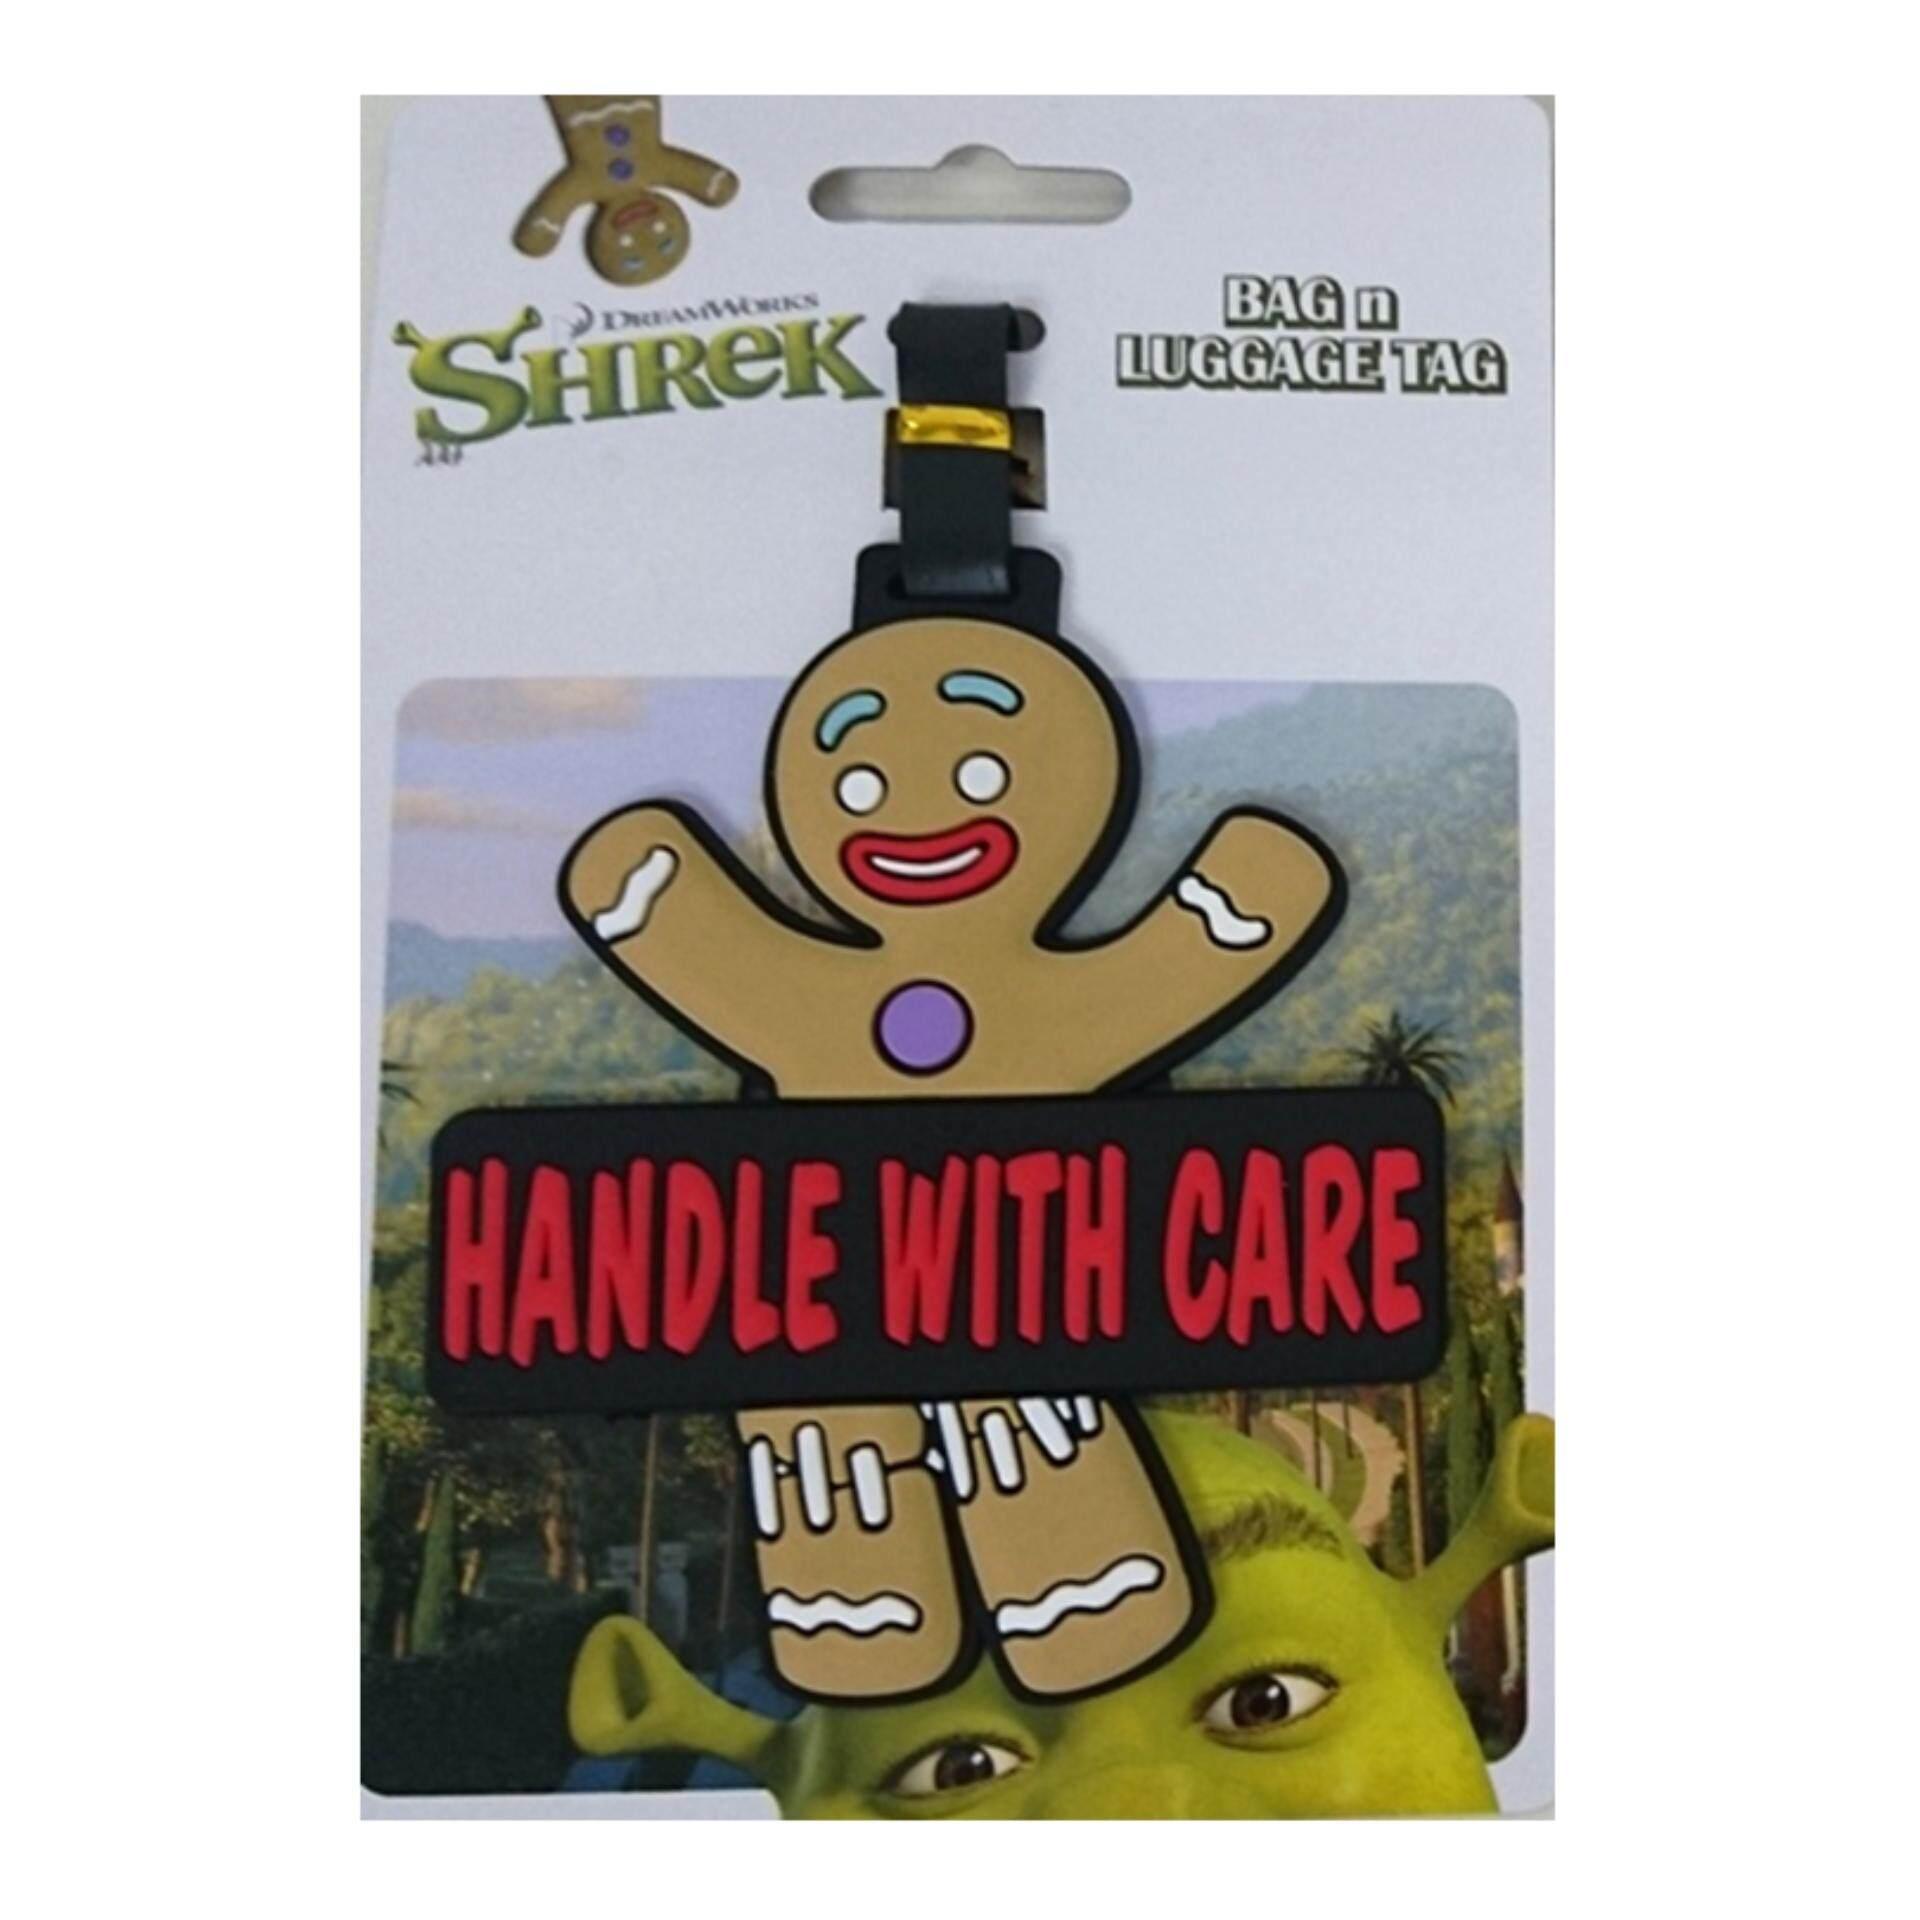 Dreamworks Shrek Luggage Tag - Gingry